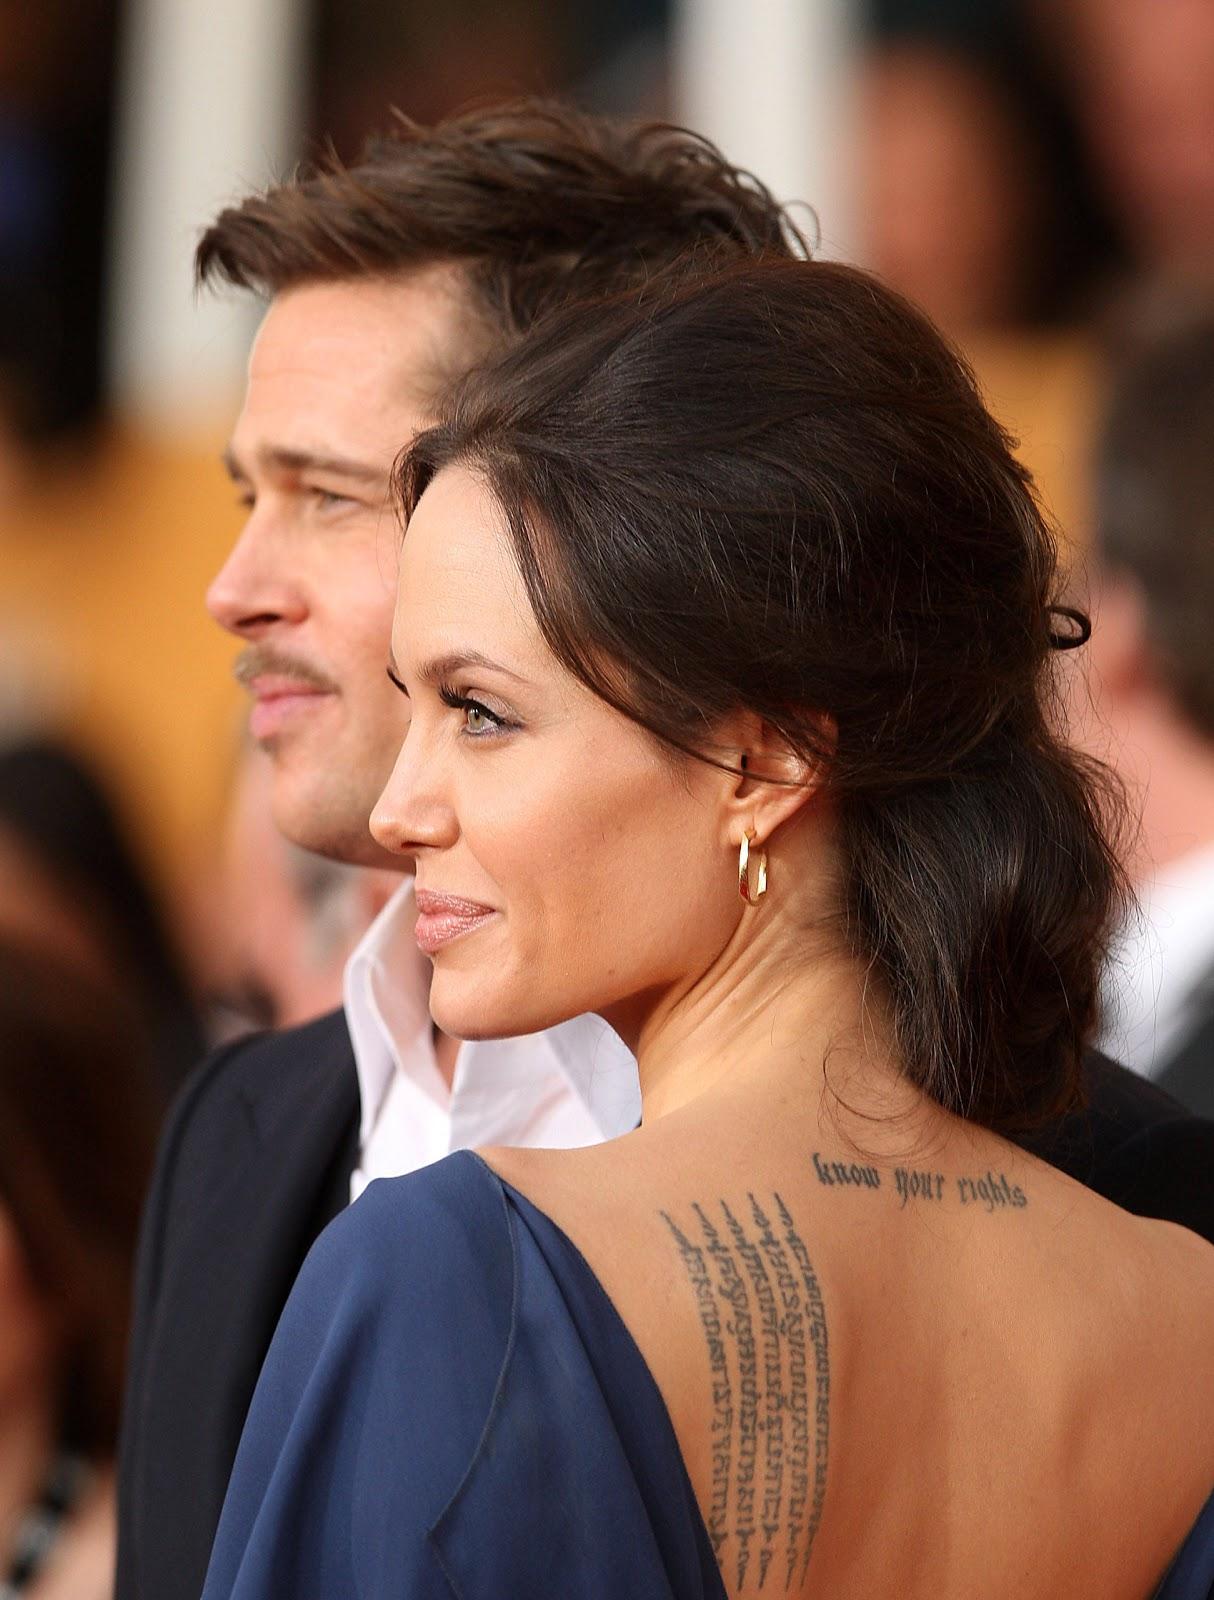 http://2.bp.blogspot.com/-9h4j59QrI6o/UGP-tTEH5nI/AAAAAAAAATI/fEDLZfWpZ9w/s1600/2-angelina-jolie-neck-tattoo.jpg